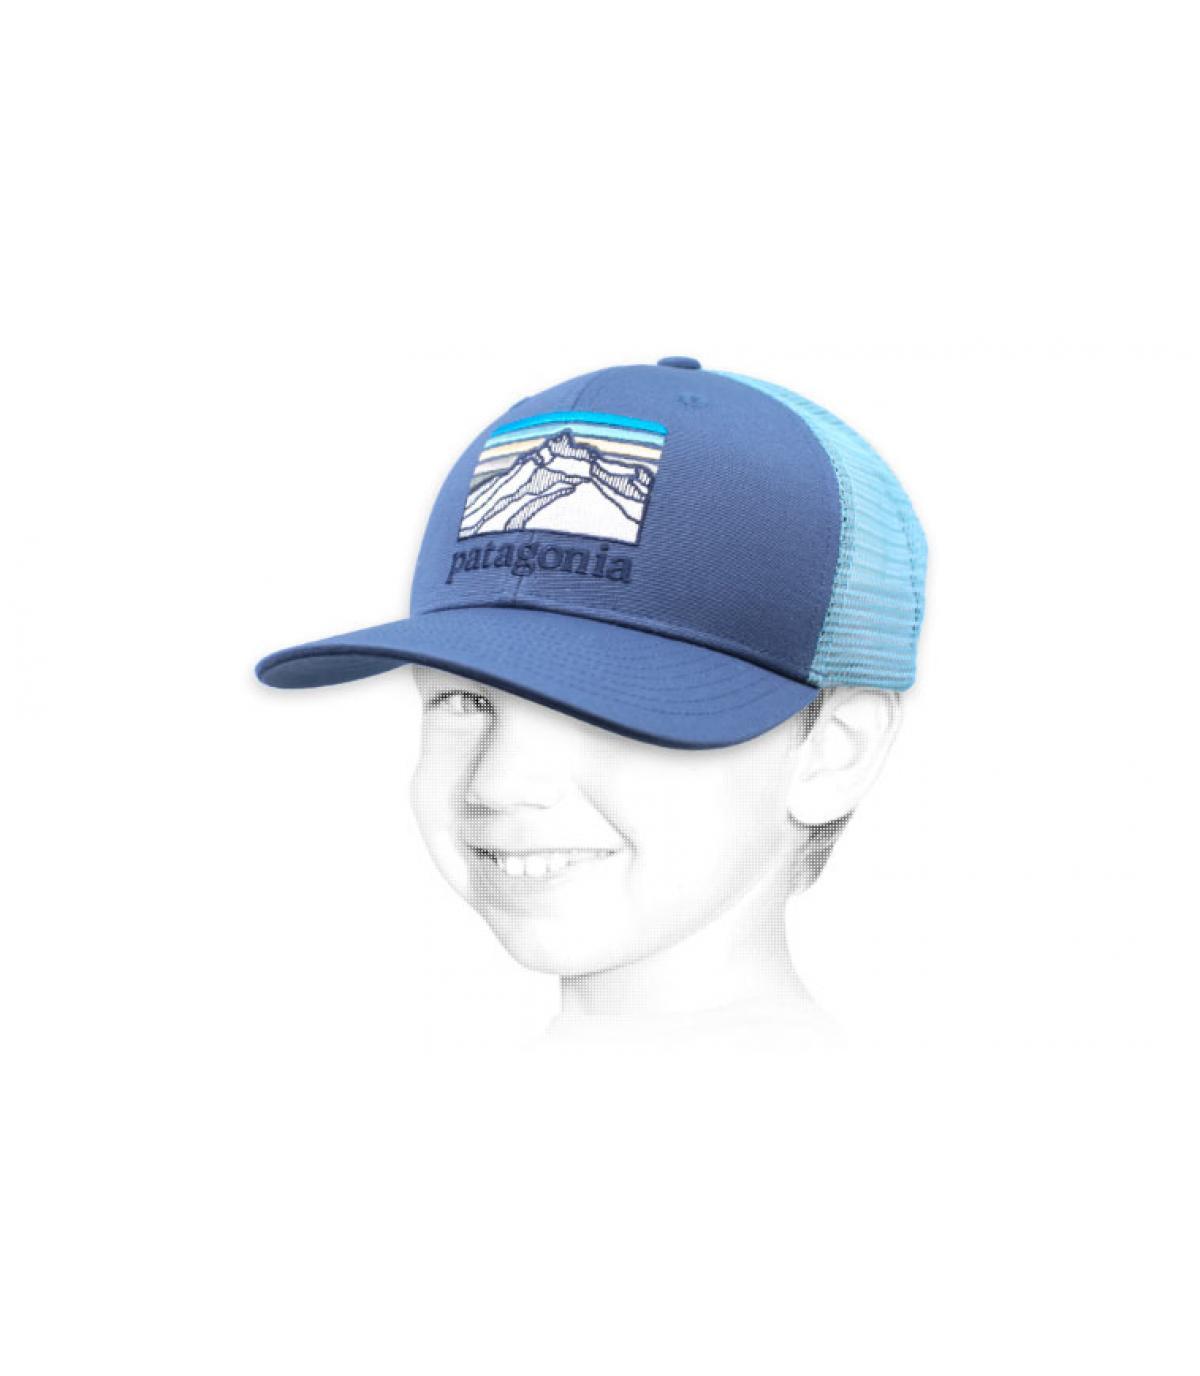 Kinder Trucker Patagonia blau